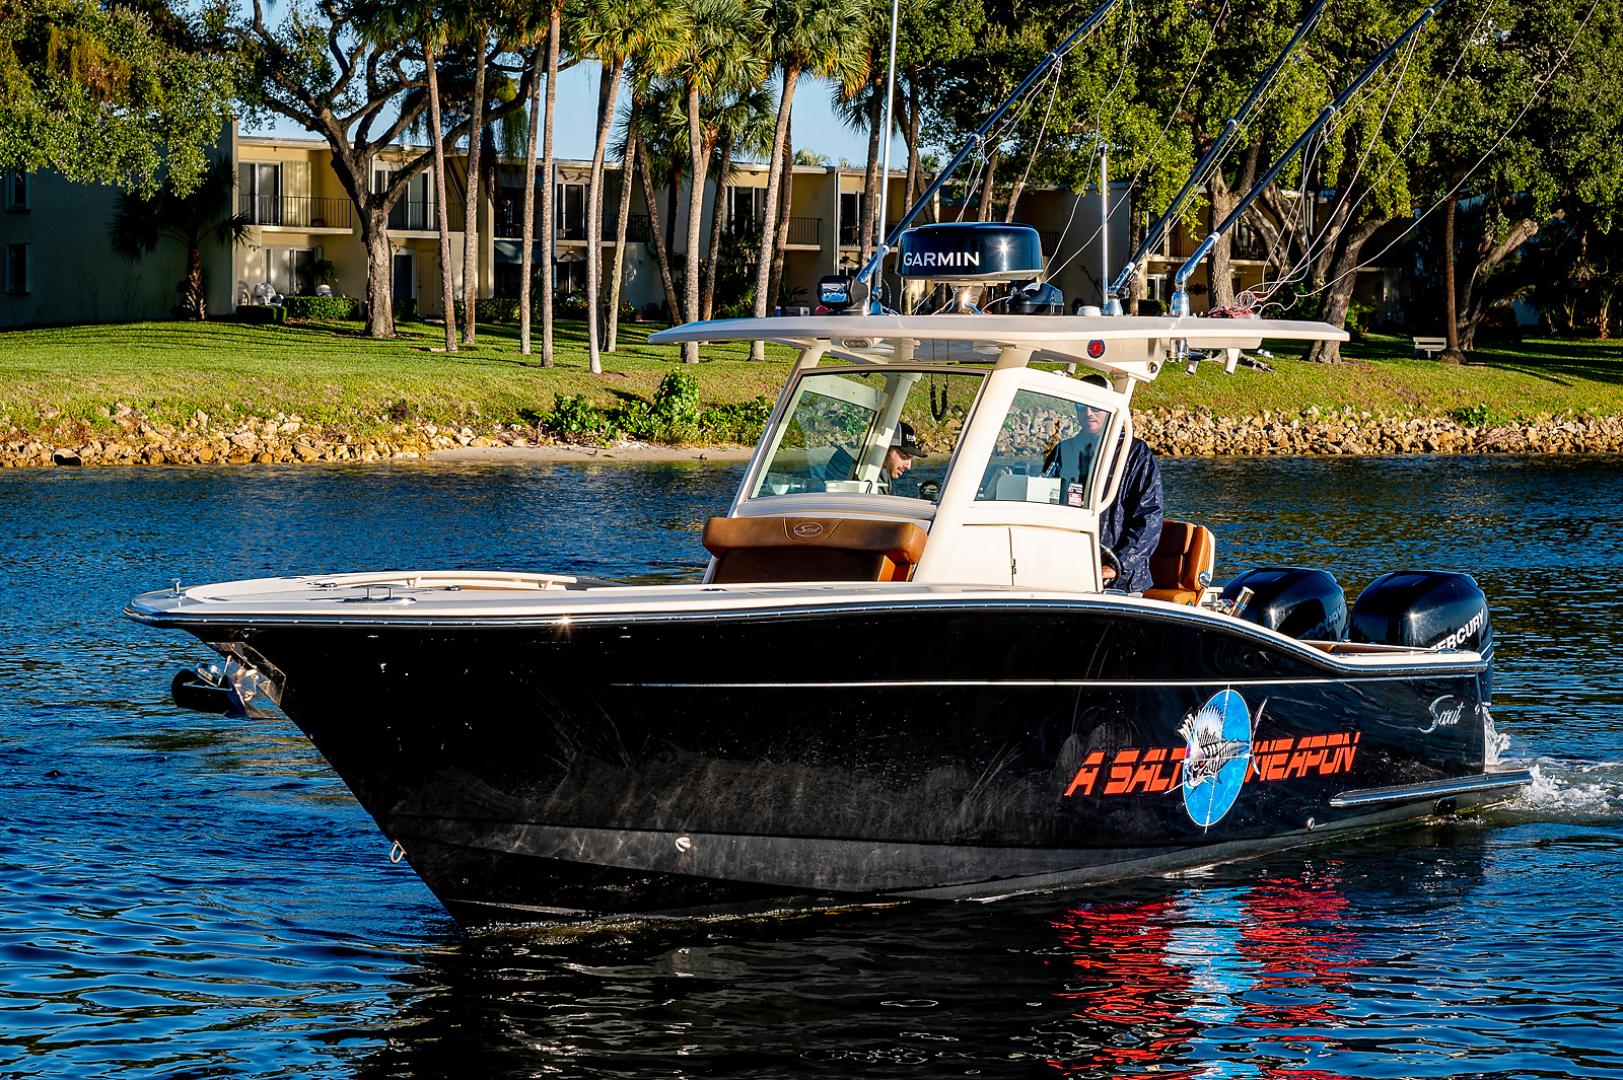 Scout-300 LXF 2017-A Salt Weapon Palm Beach Gardens-Florida-United States-A Salt Weapon-1571118 | Thumbnail